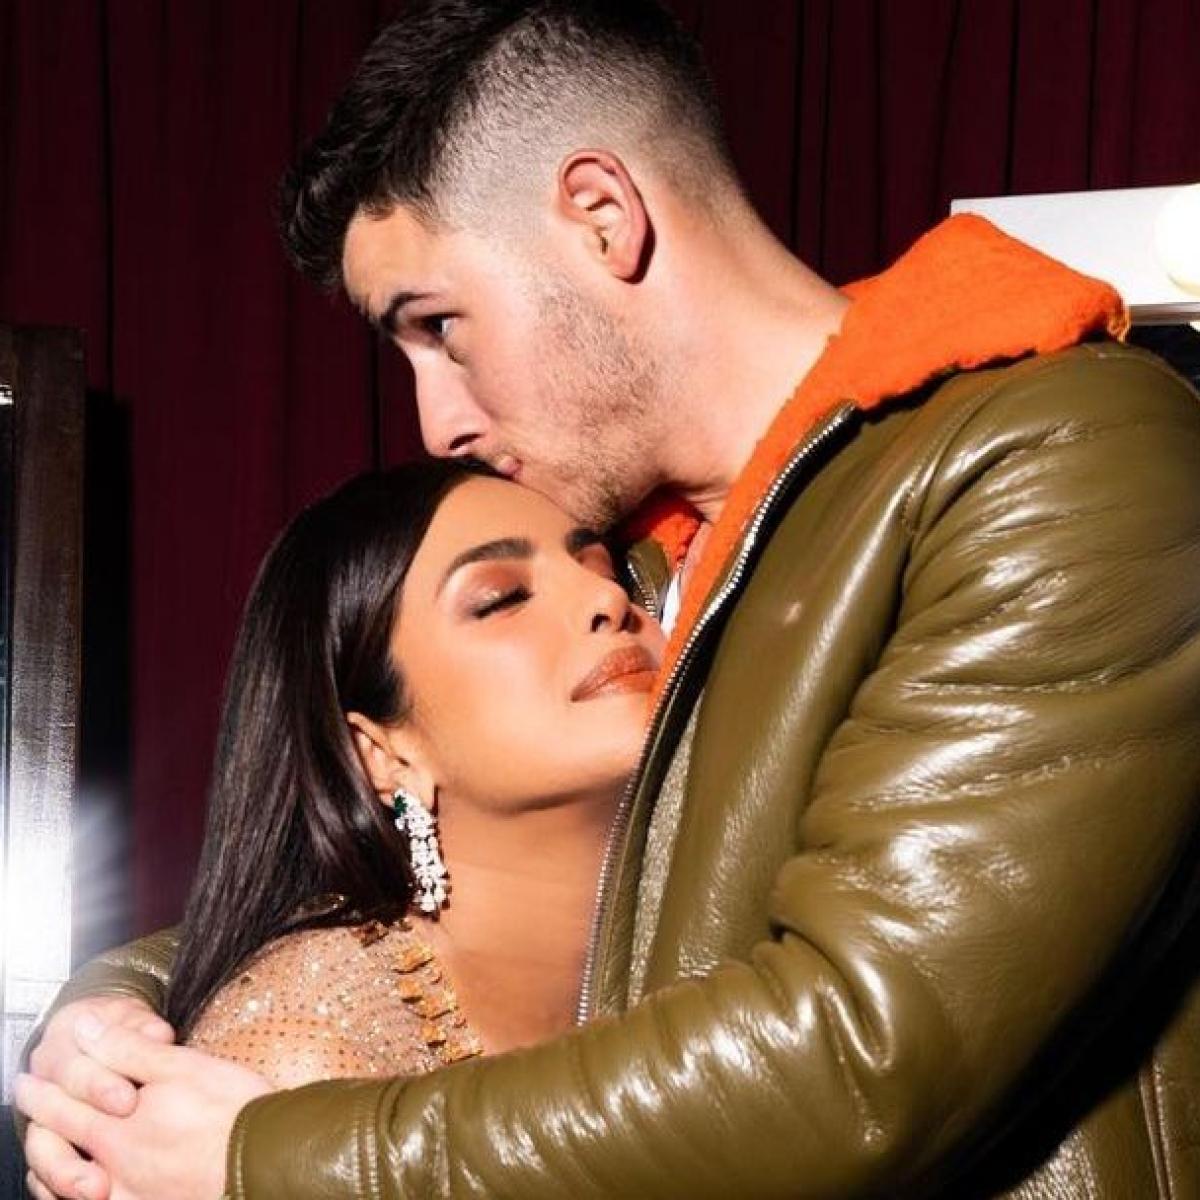 'Not even a cracked rib can stop him': Priyanka Chopra shares an 'appreciation post' for Nick Jonas